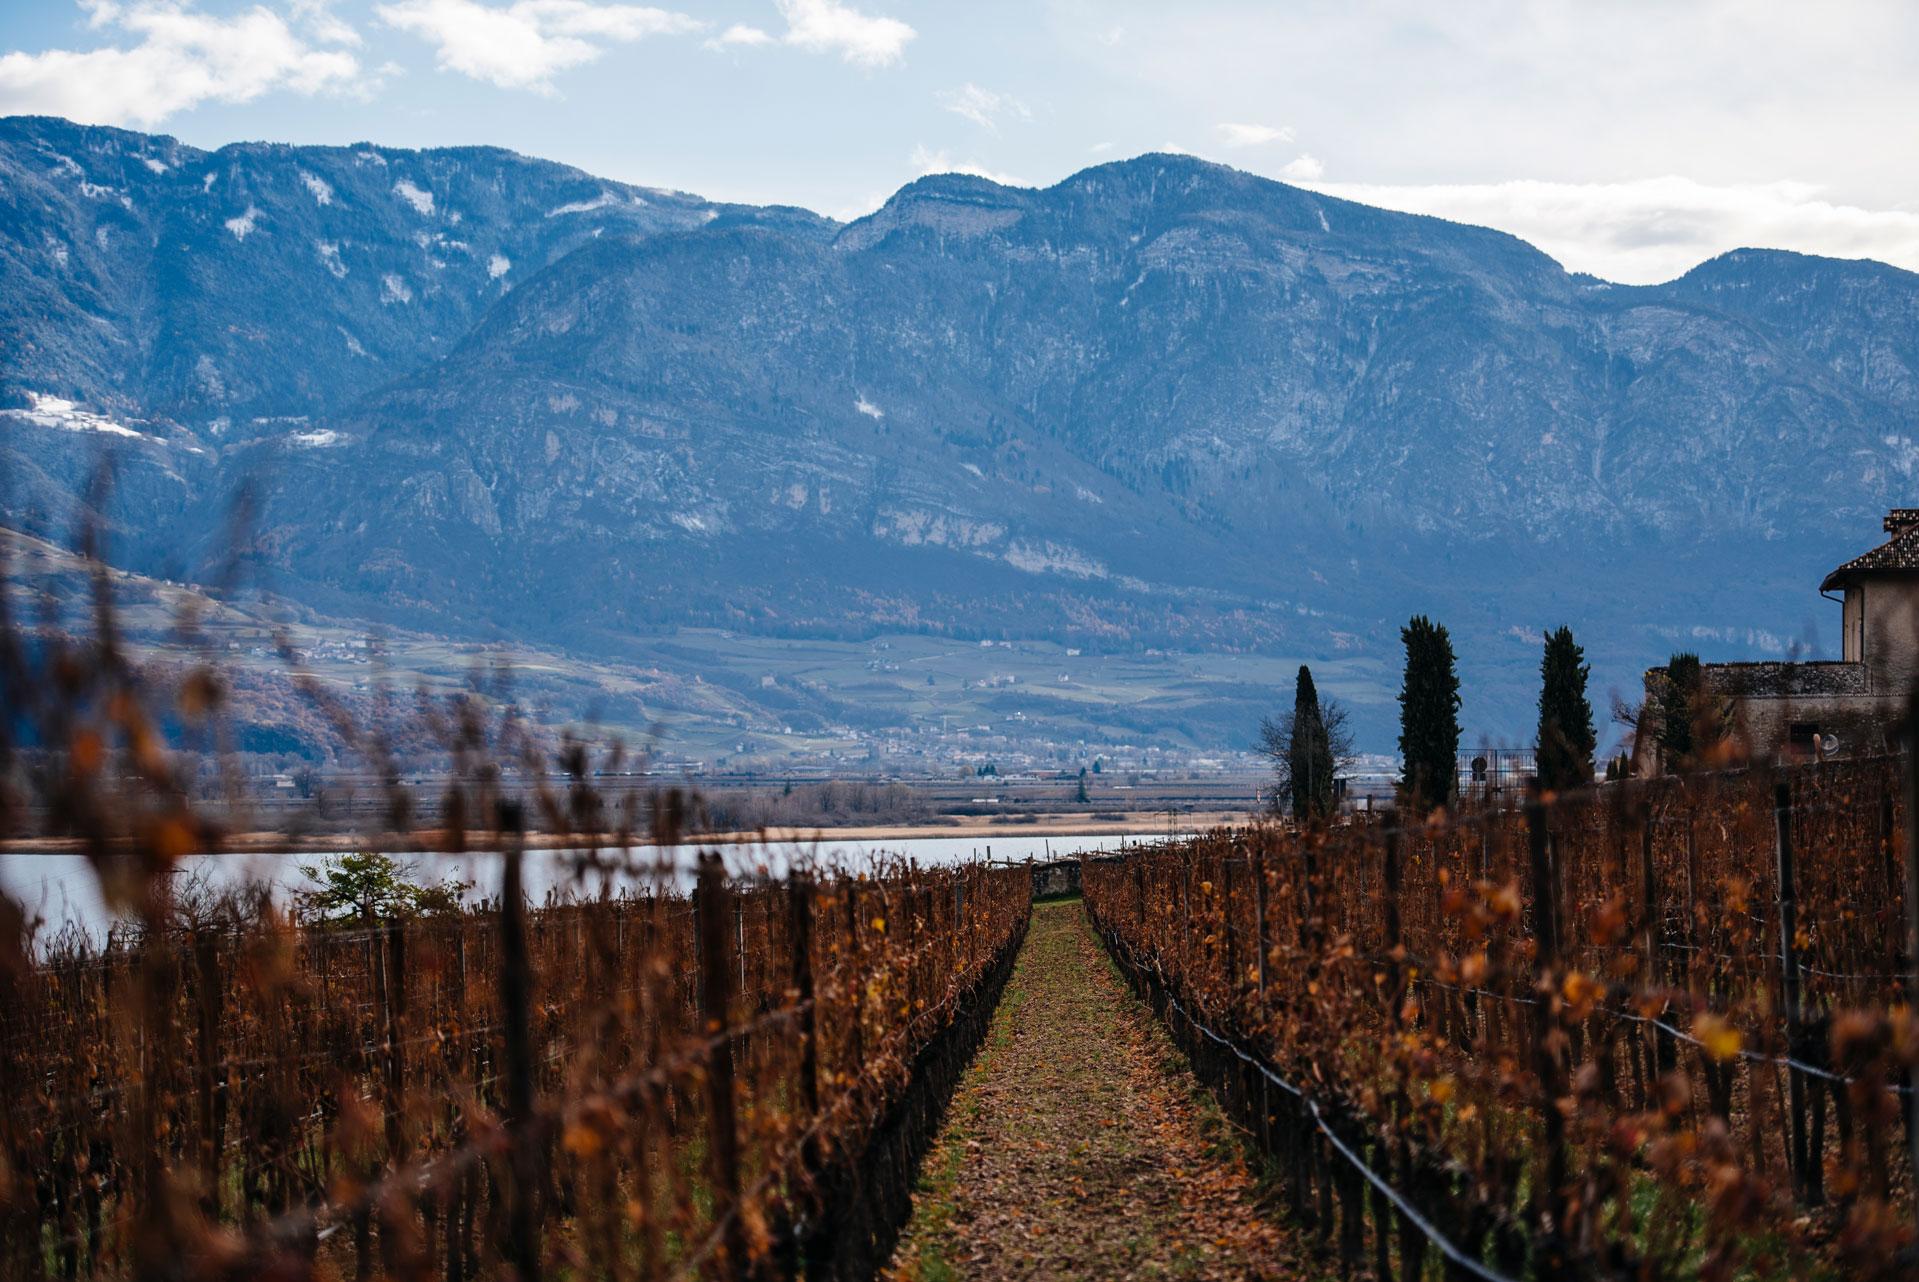 Manincor vineyards | Caldaro | Alto Adige | Italy